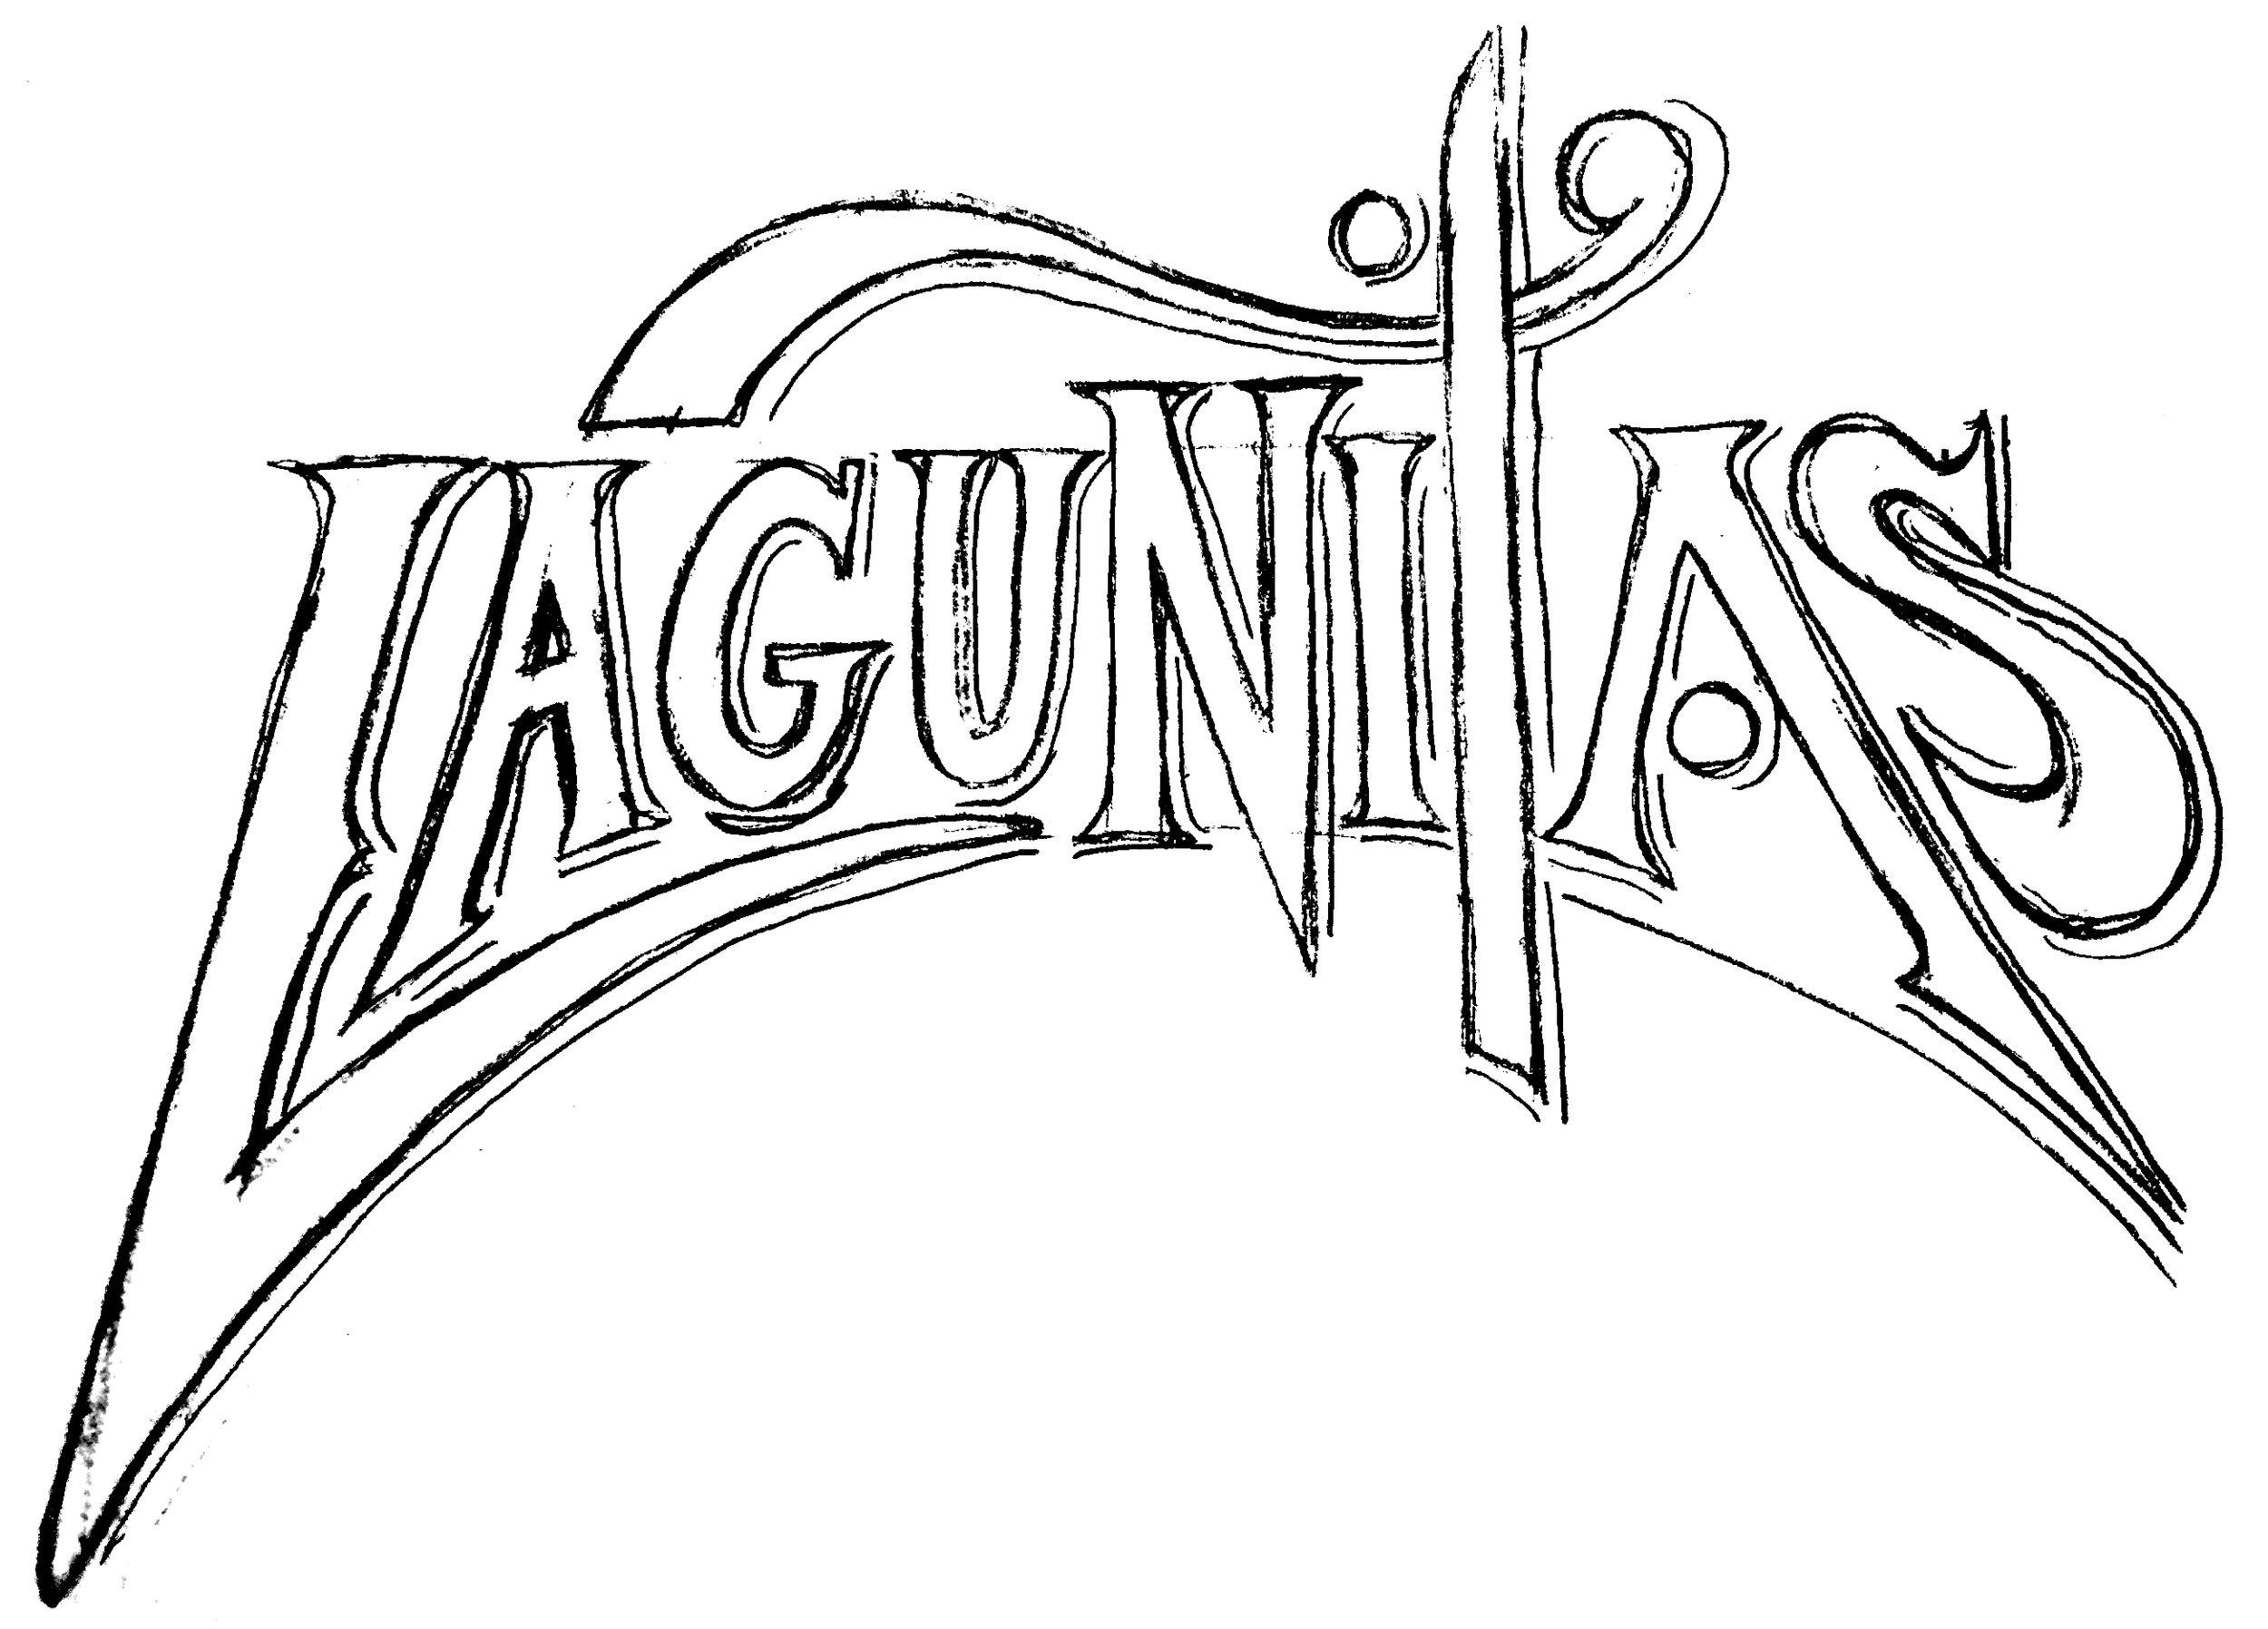 LAGUNITAS BIG BRAND       Art Direction, Branding, Illustration, & more  May 2015